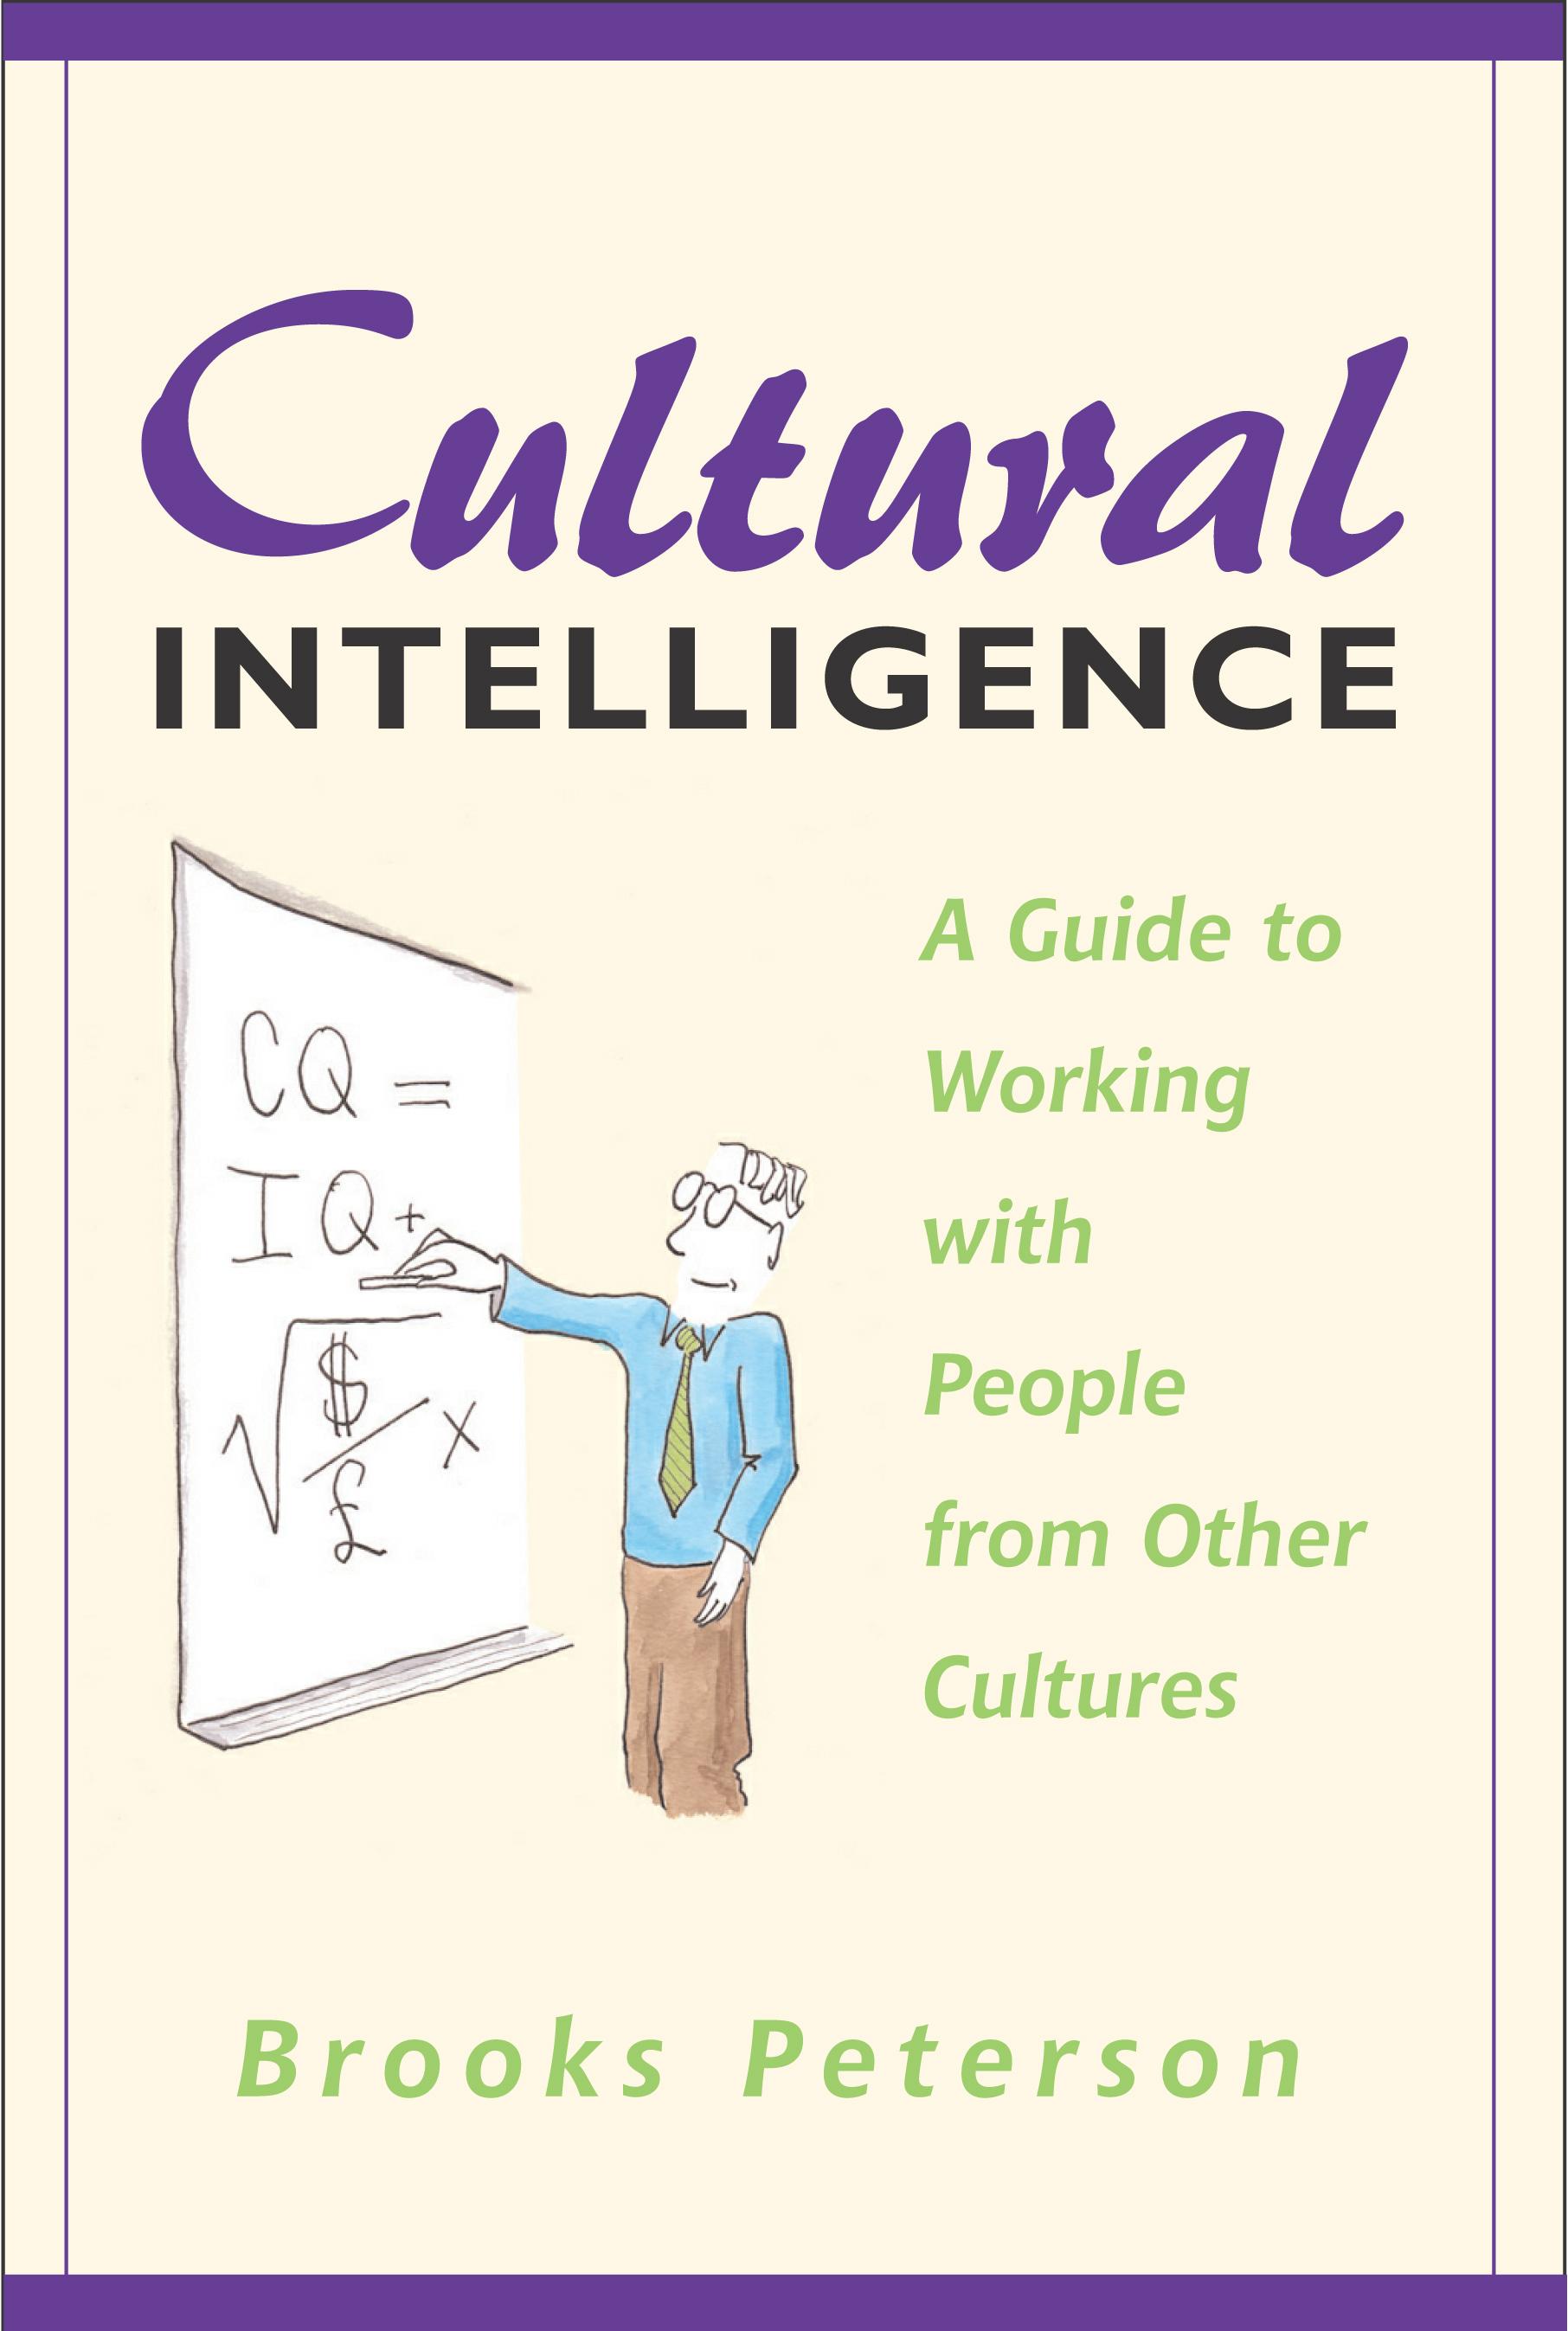 CulturalIntelligence hi-res.jpg